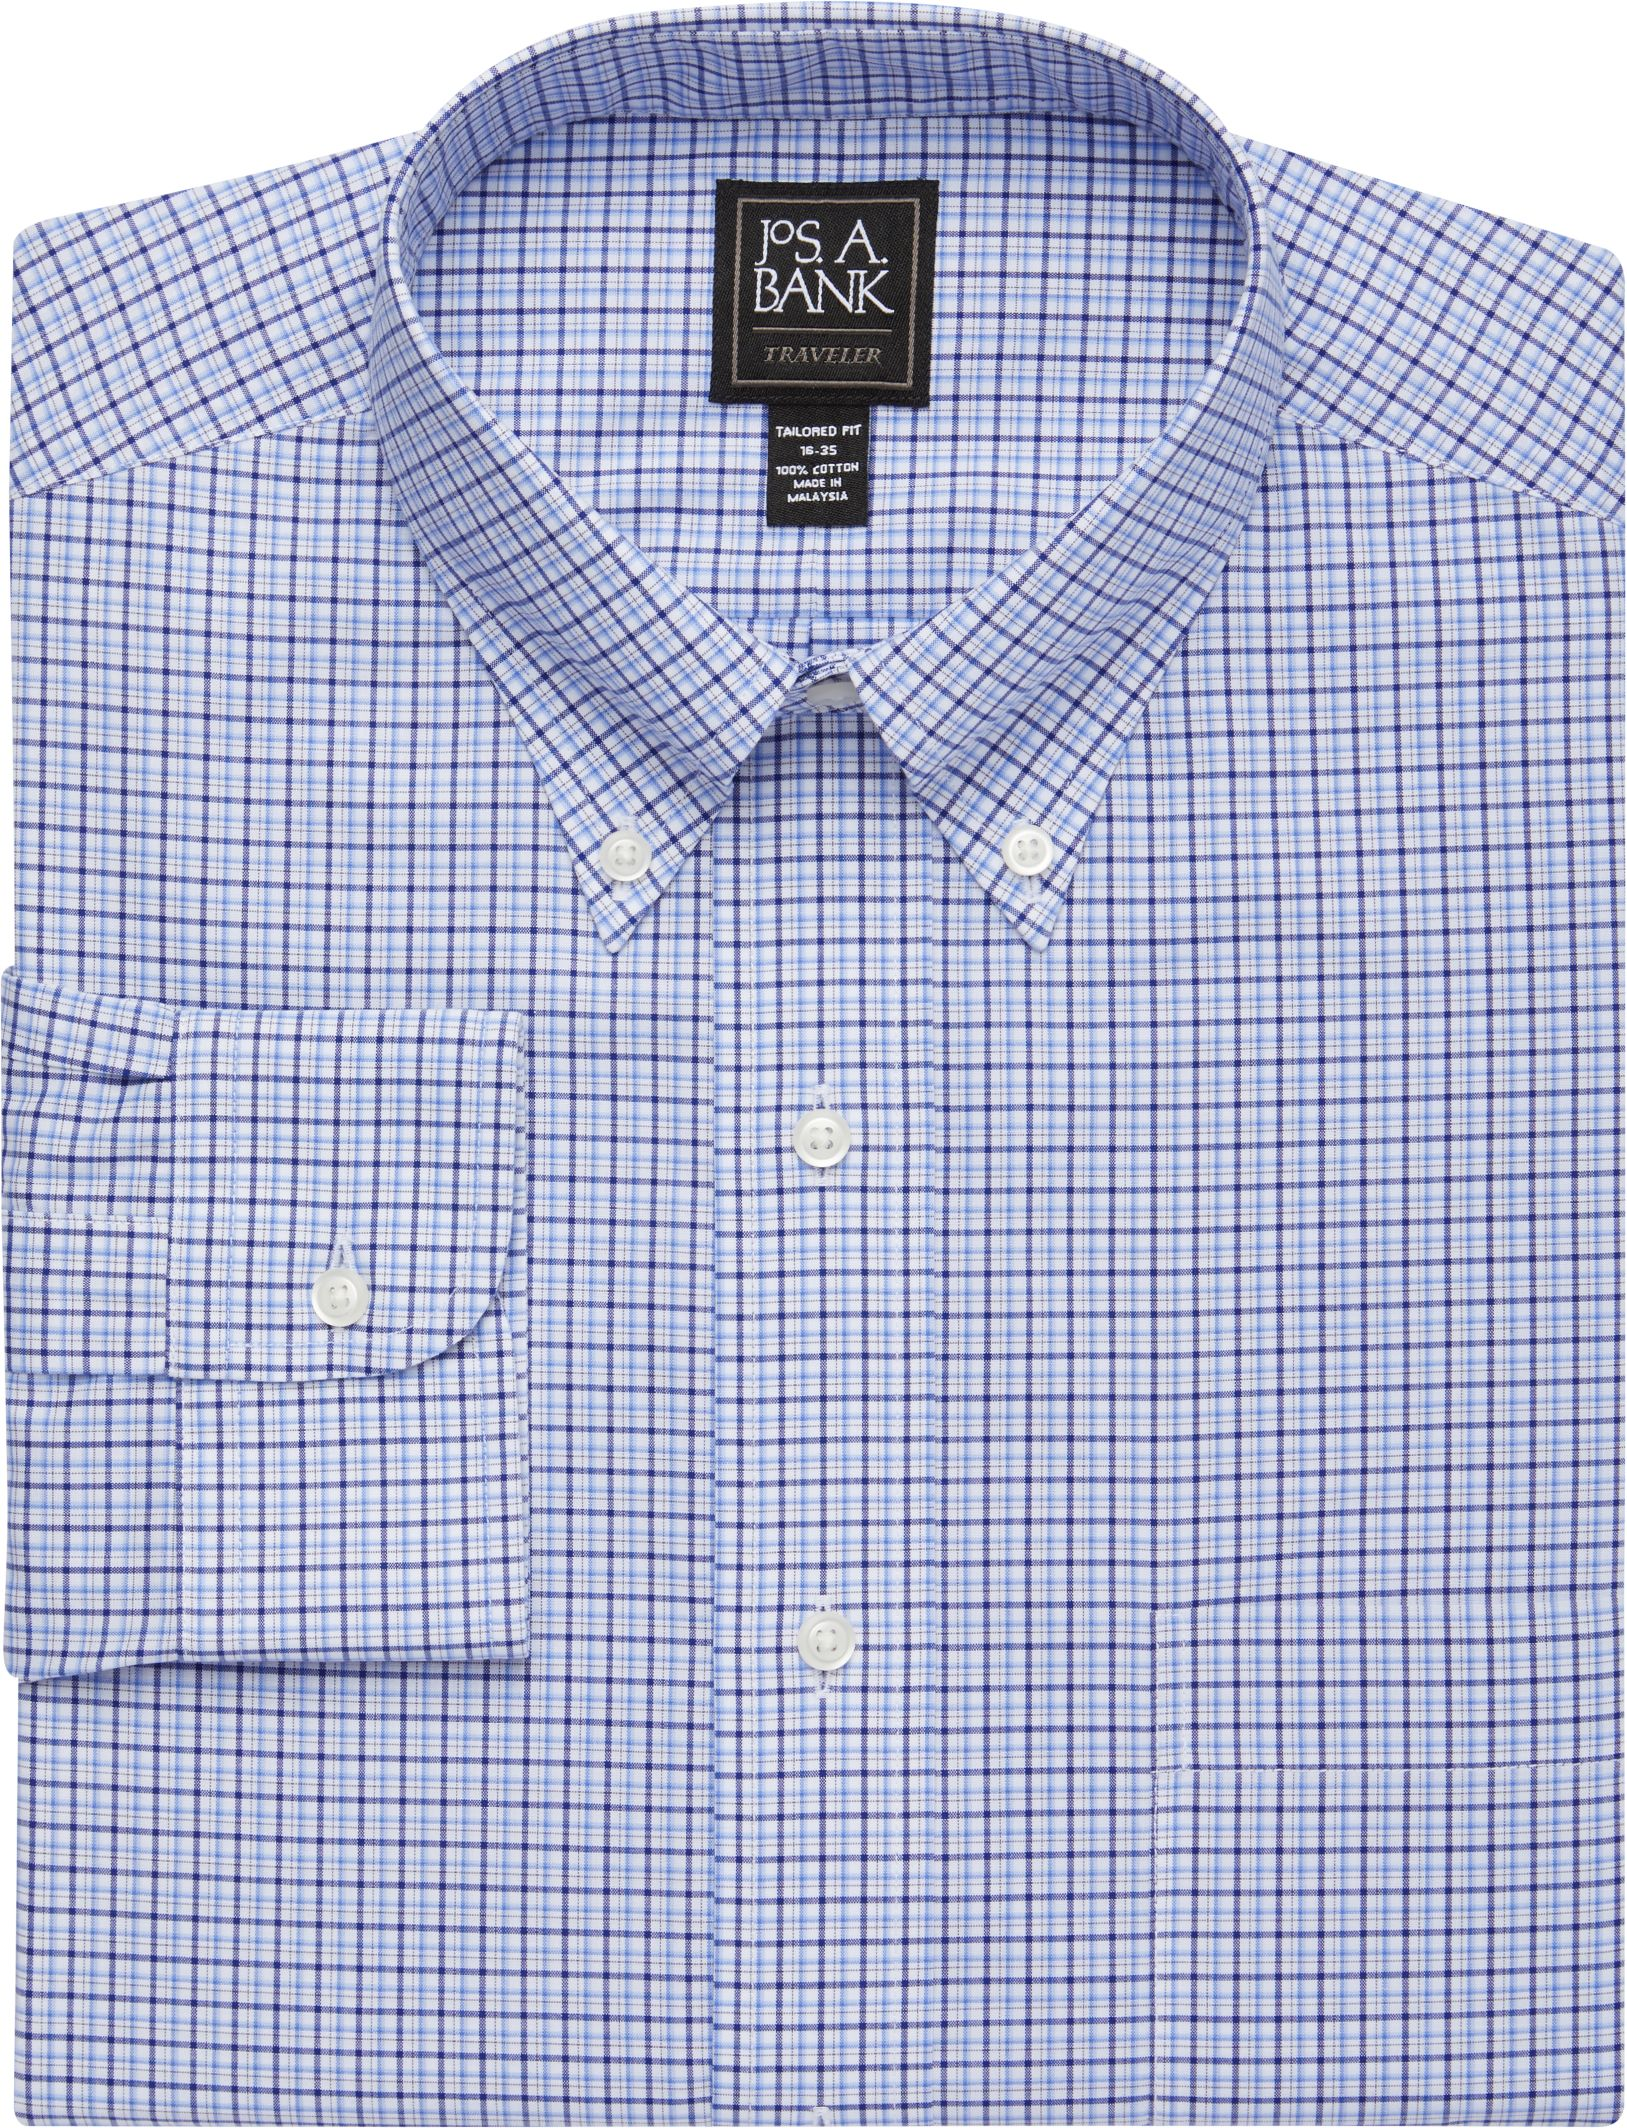 240d3a10471ce5 Traveler Collection Tailored Fit Button-Down Collar Plaid Dress Shirt #53WN